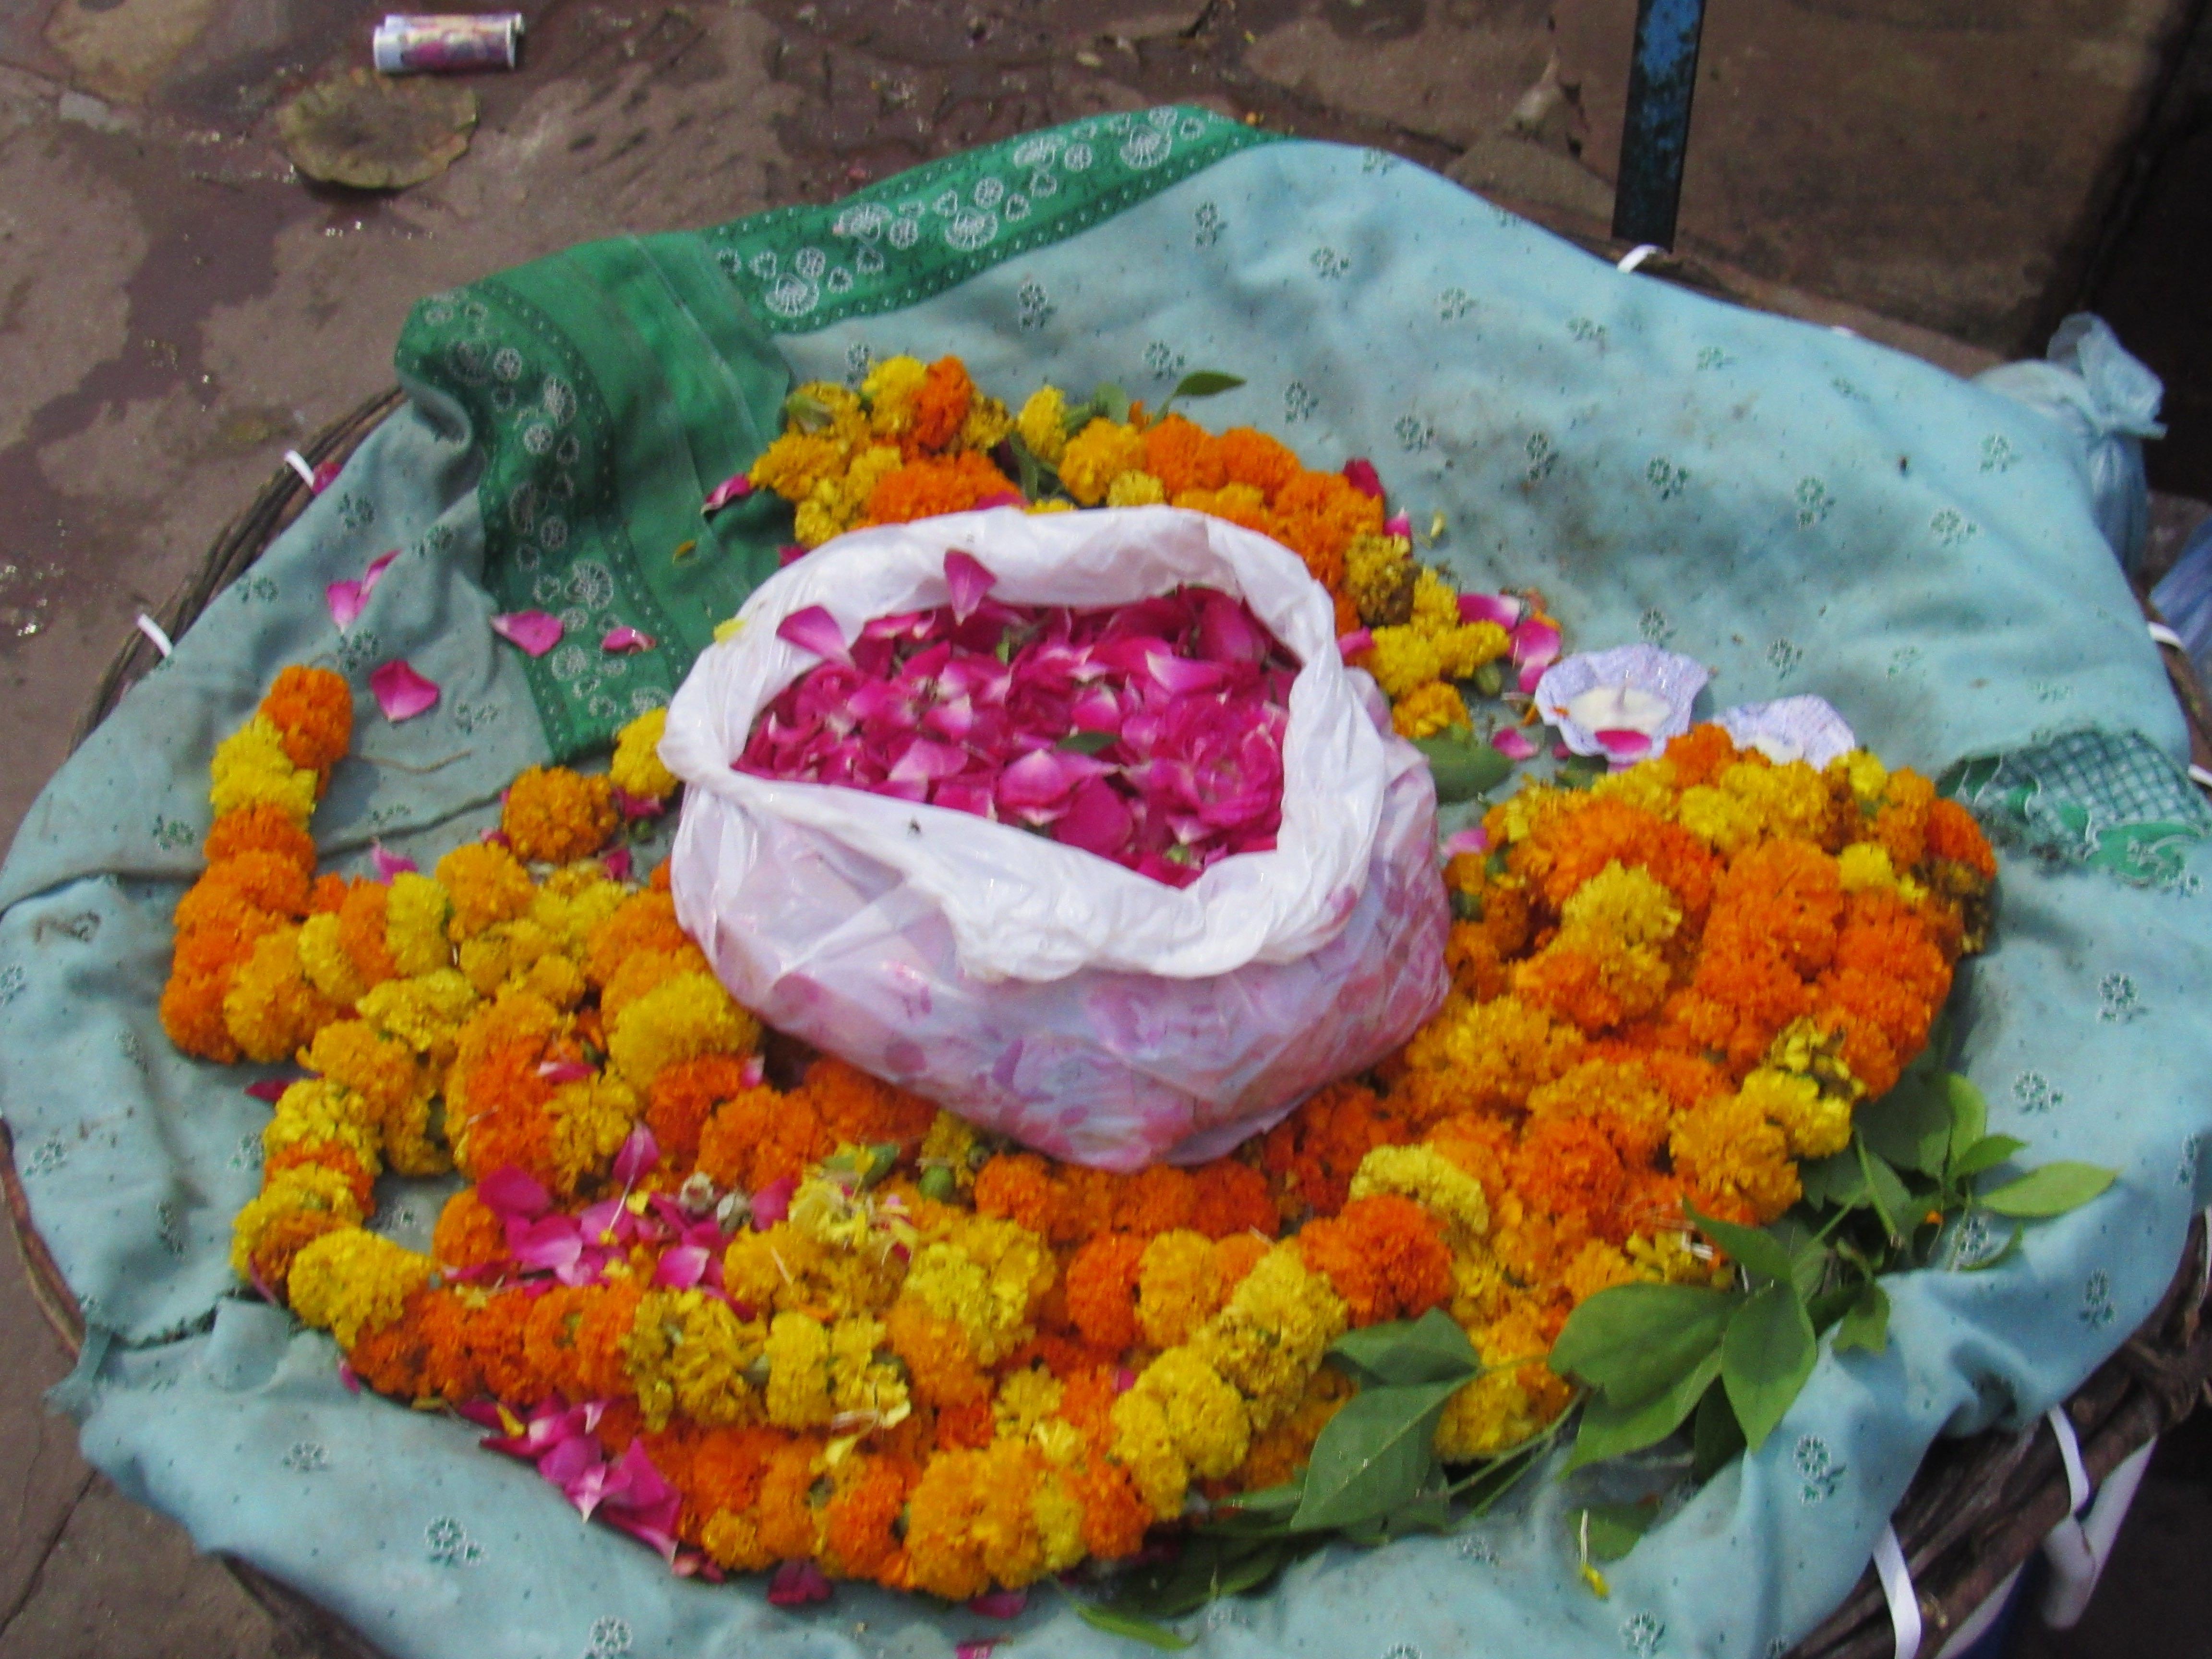 the flower petals